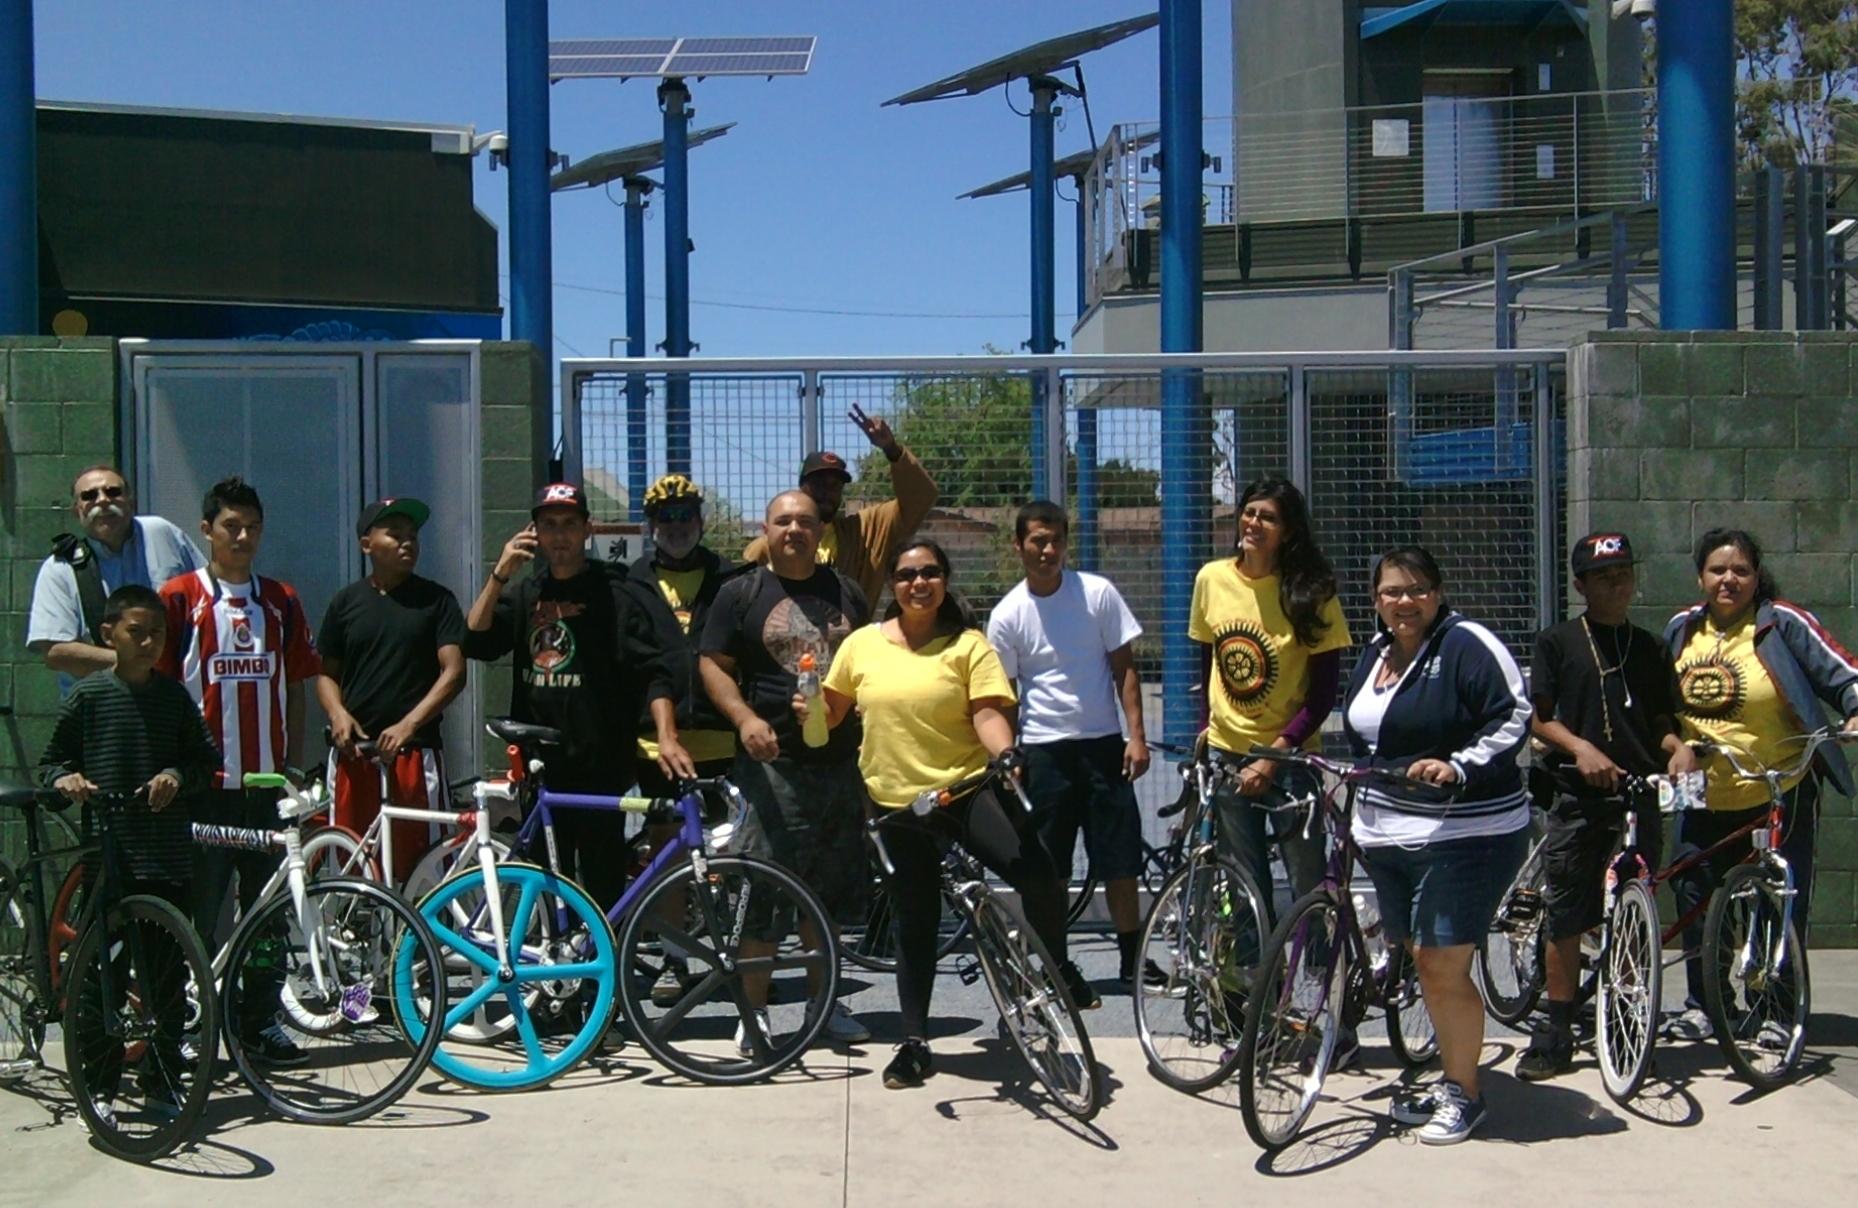 Ciclavia >> South Los Angeles | CicLAvia